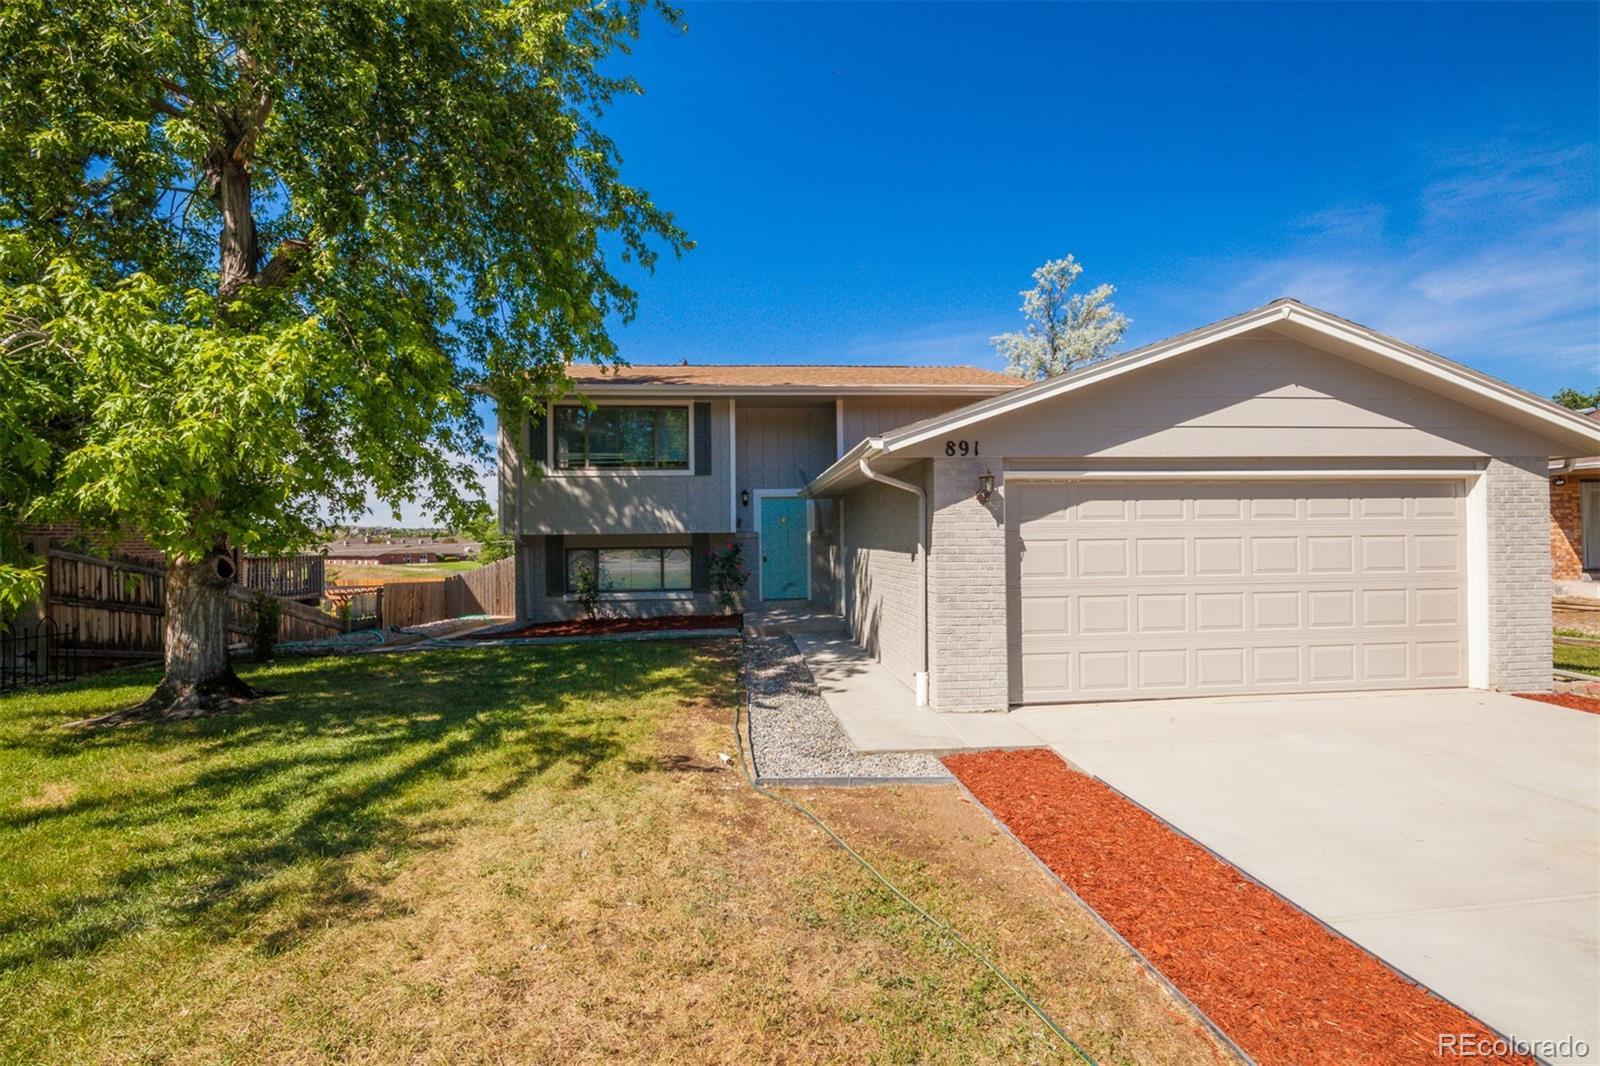 891 Sable Boulevard Property Photo - Aurora, CO real estate listing